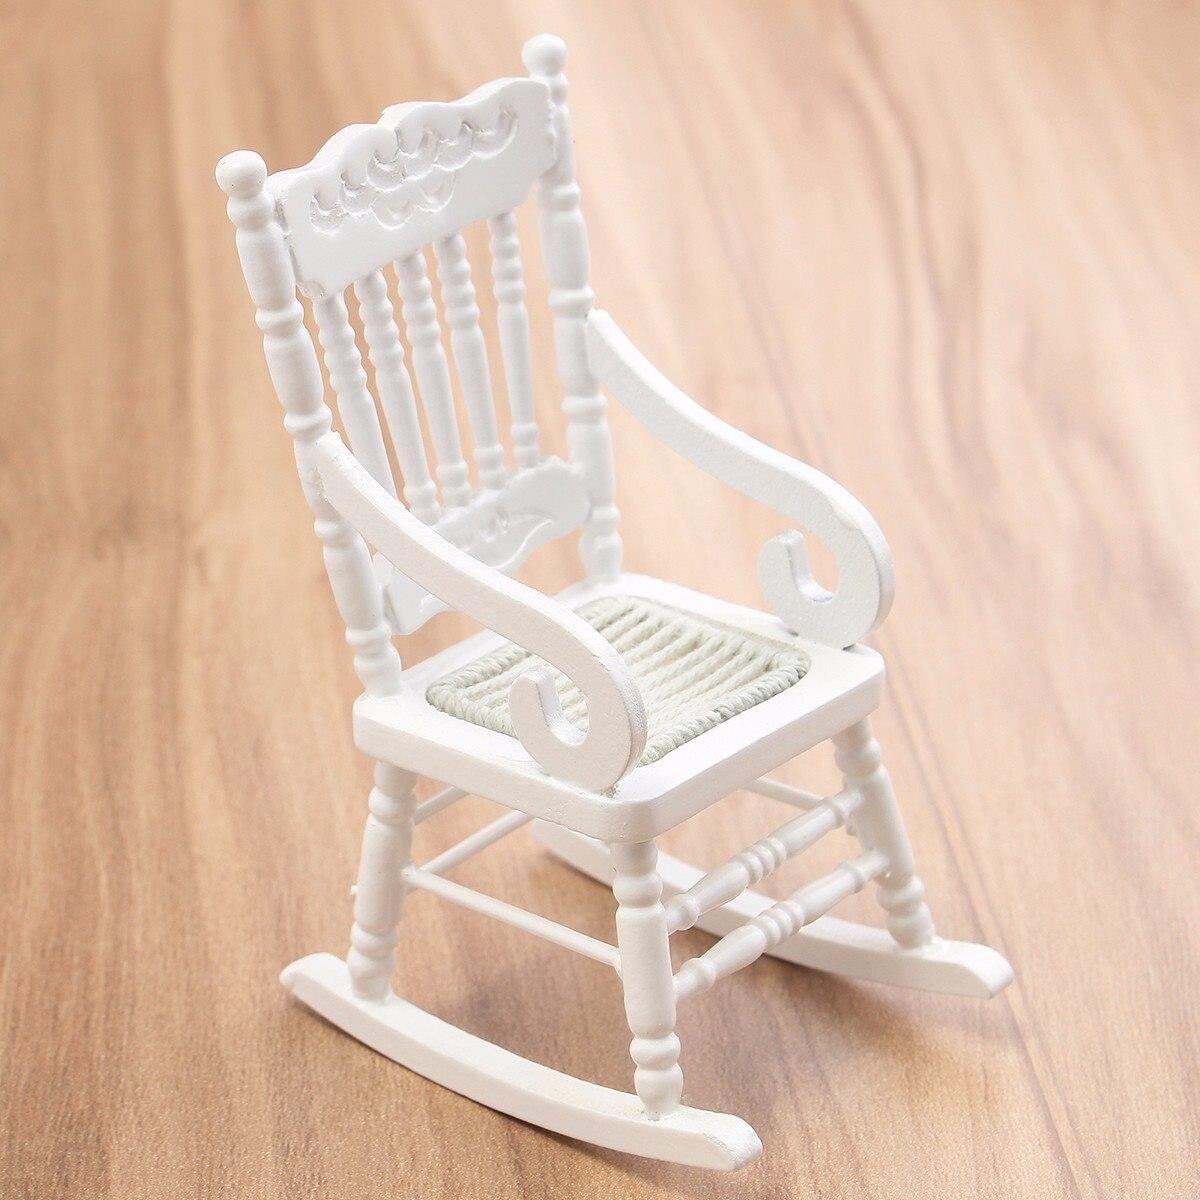 New 1:12 Dollhouse Miniature Furniture White Wooden